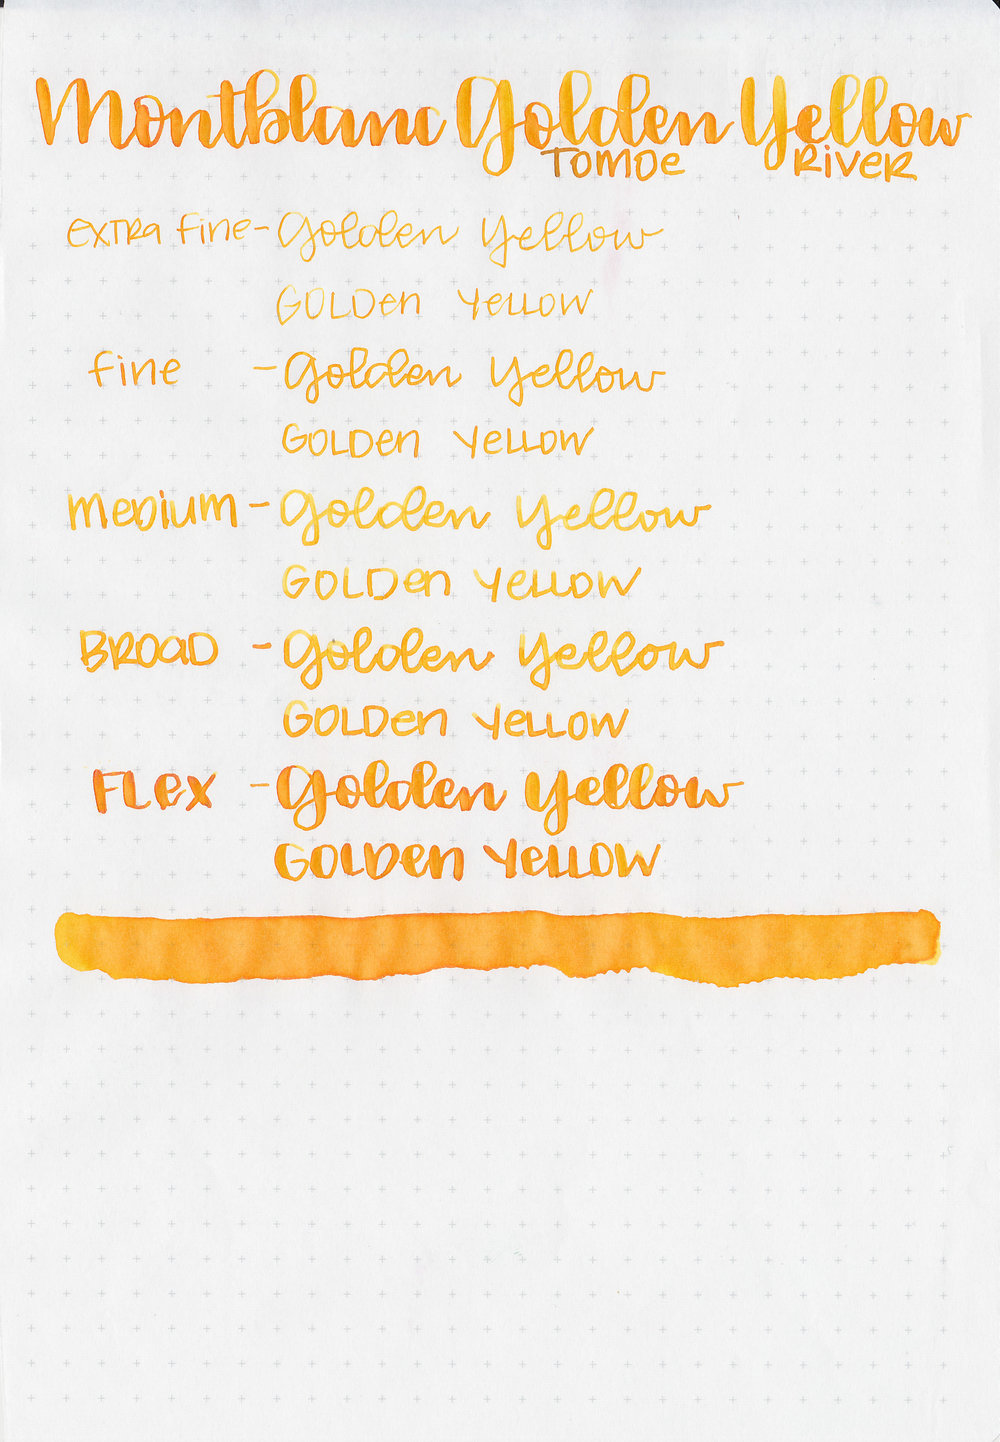 mb-golden-yellow-11.jpg